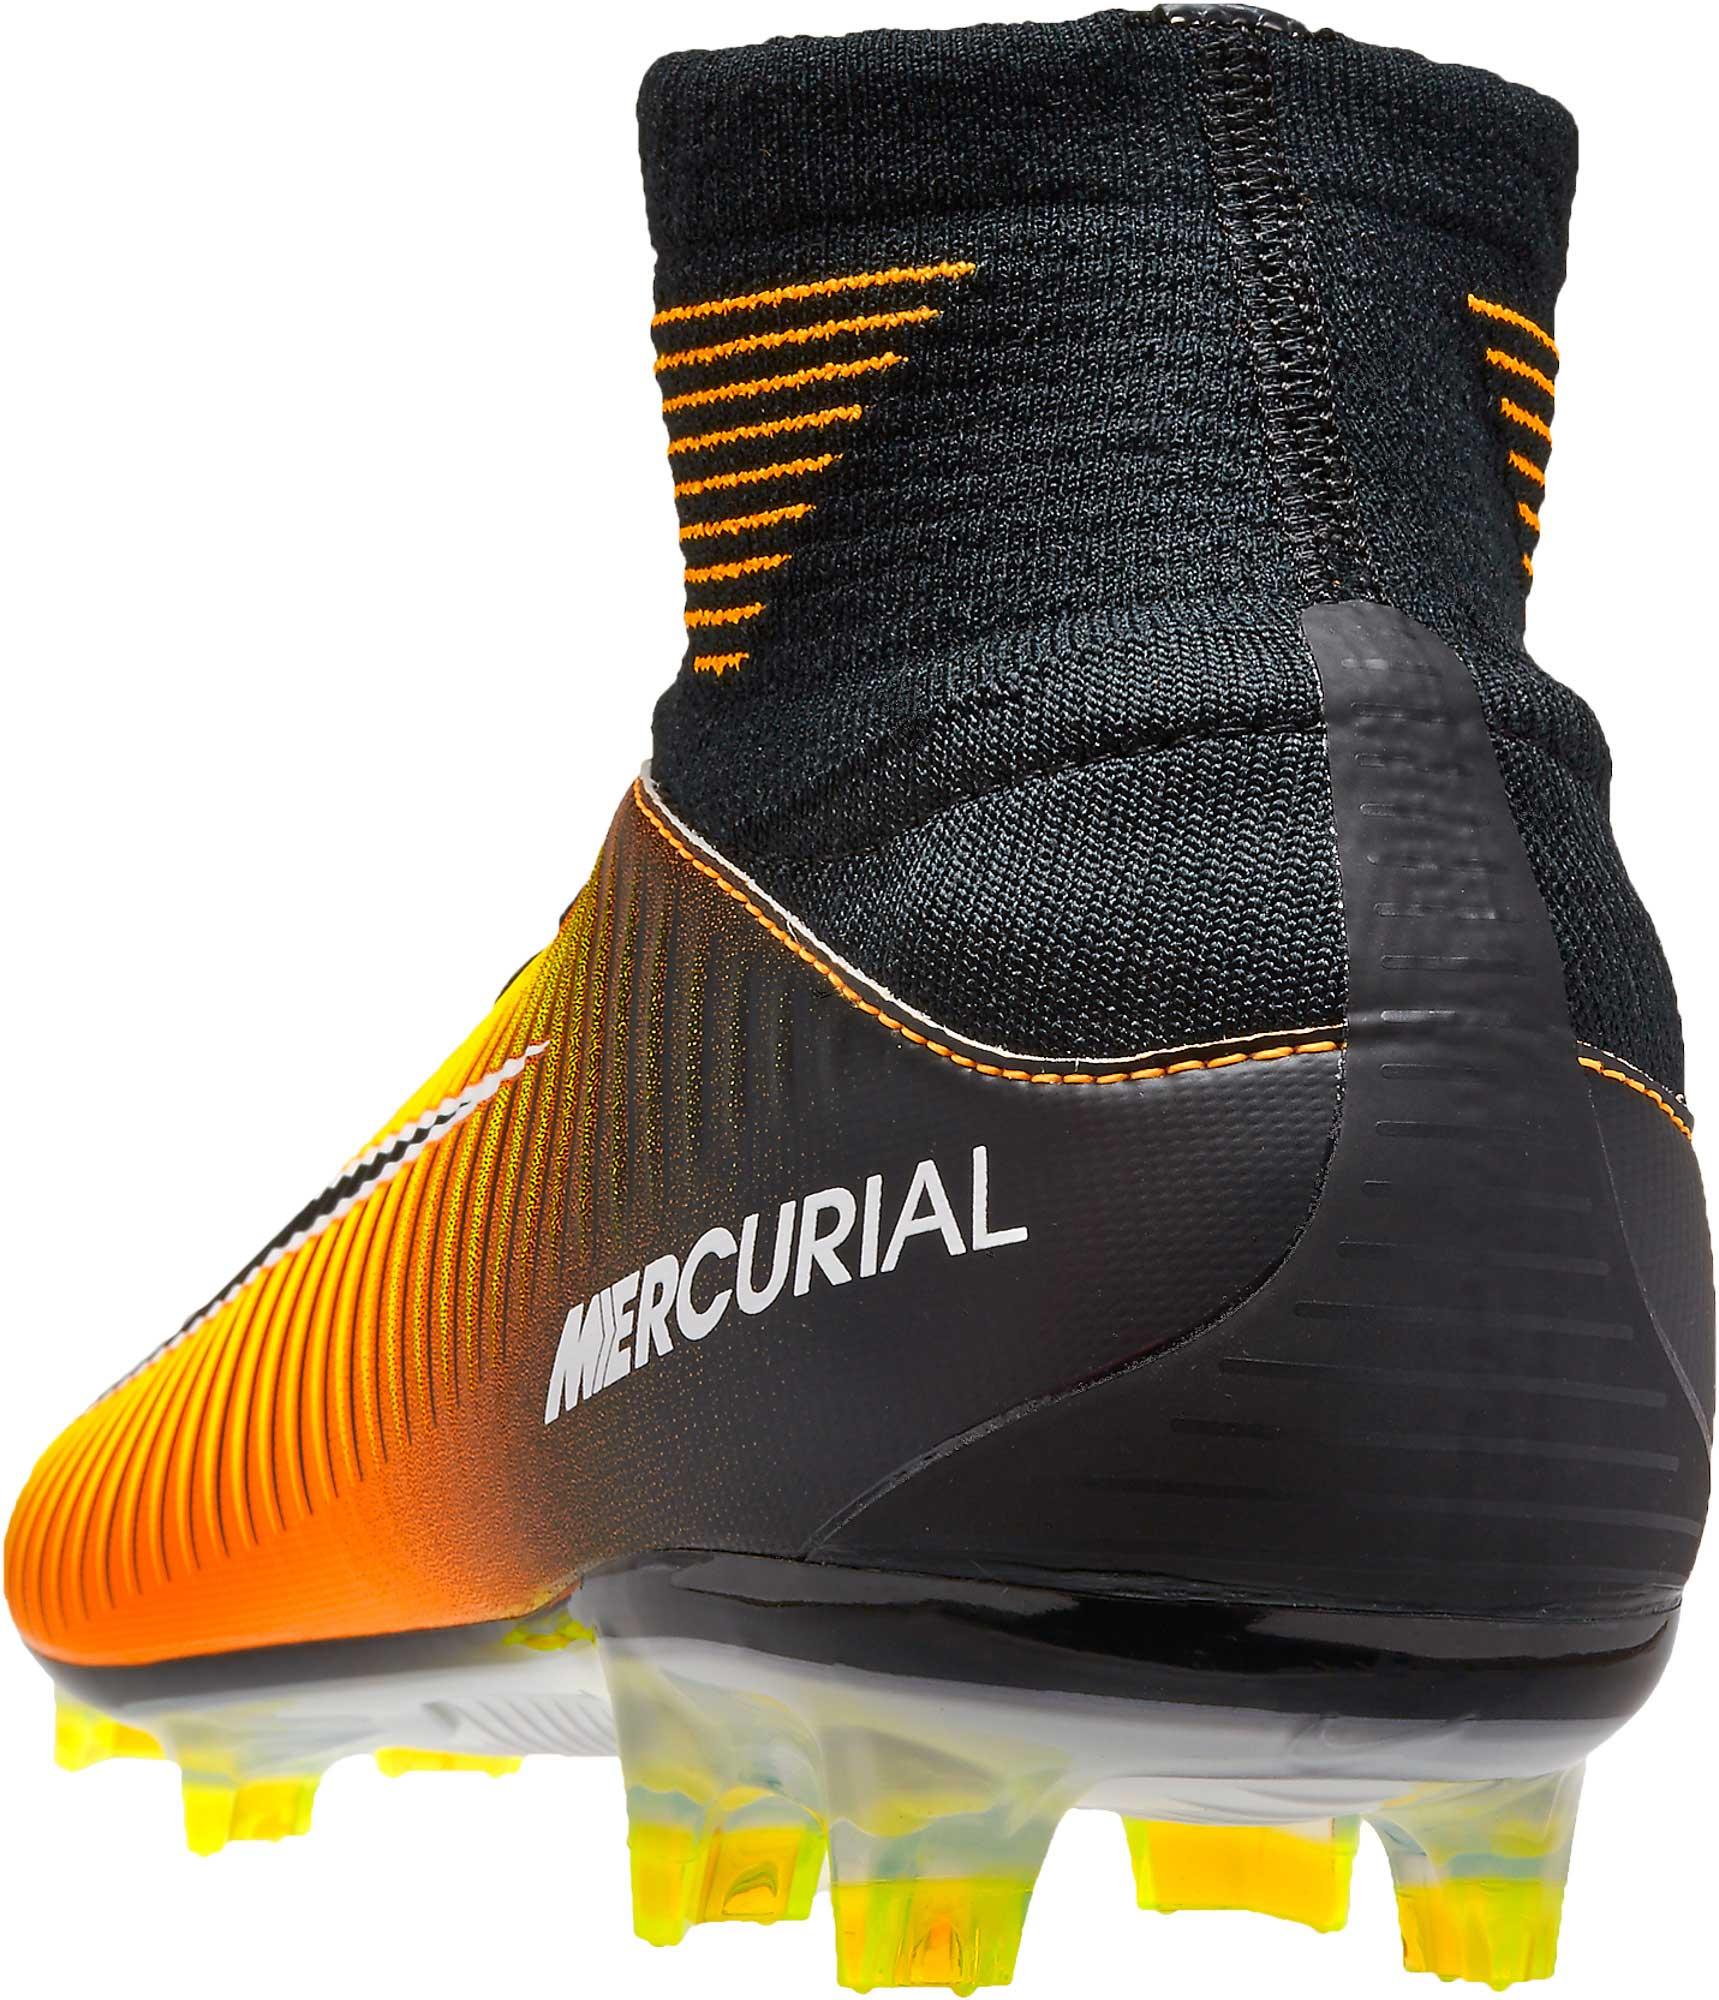 ef09bbd88 Nike Mercurial Veloce III DF FG Soccer Cleats- SoccerPro.com